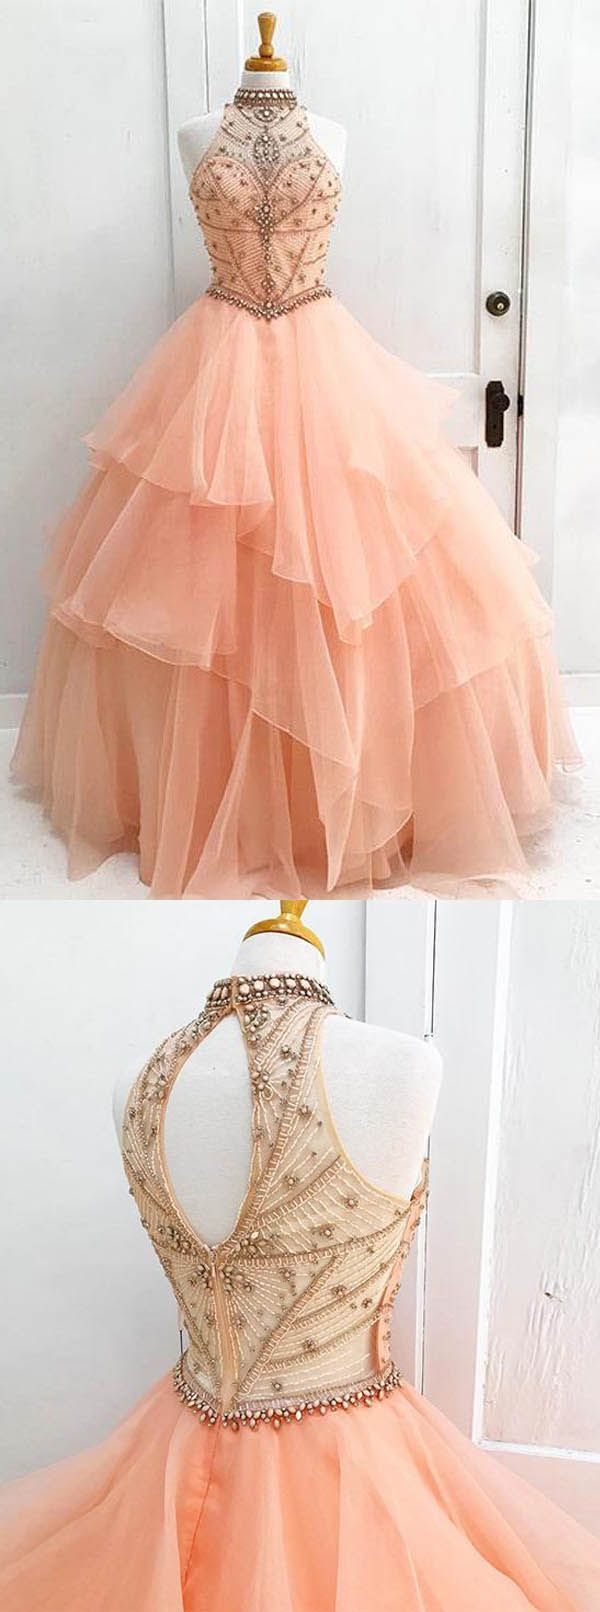 Ball Gown High Neck Orange Long Tulle Prom Dress with Beading PG521 #promdress #longpromdress #ballgown #dress #pgmdress